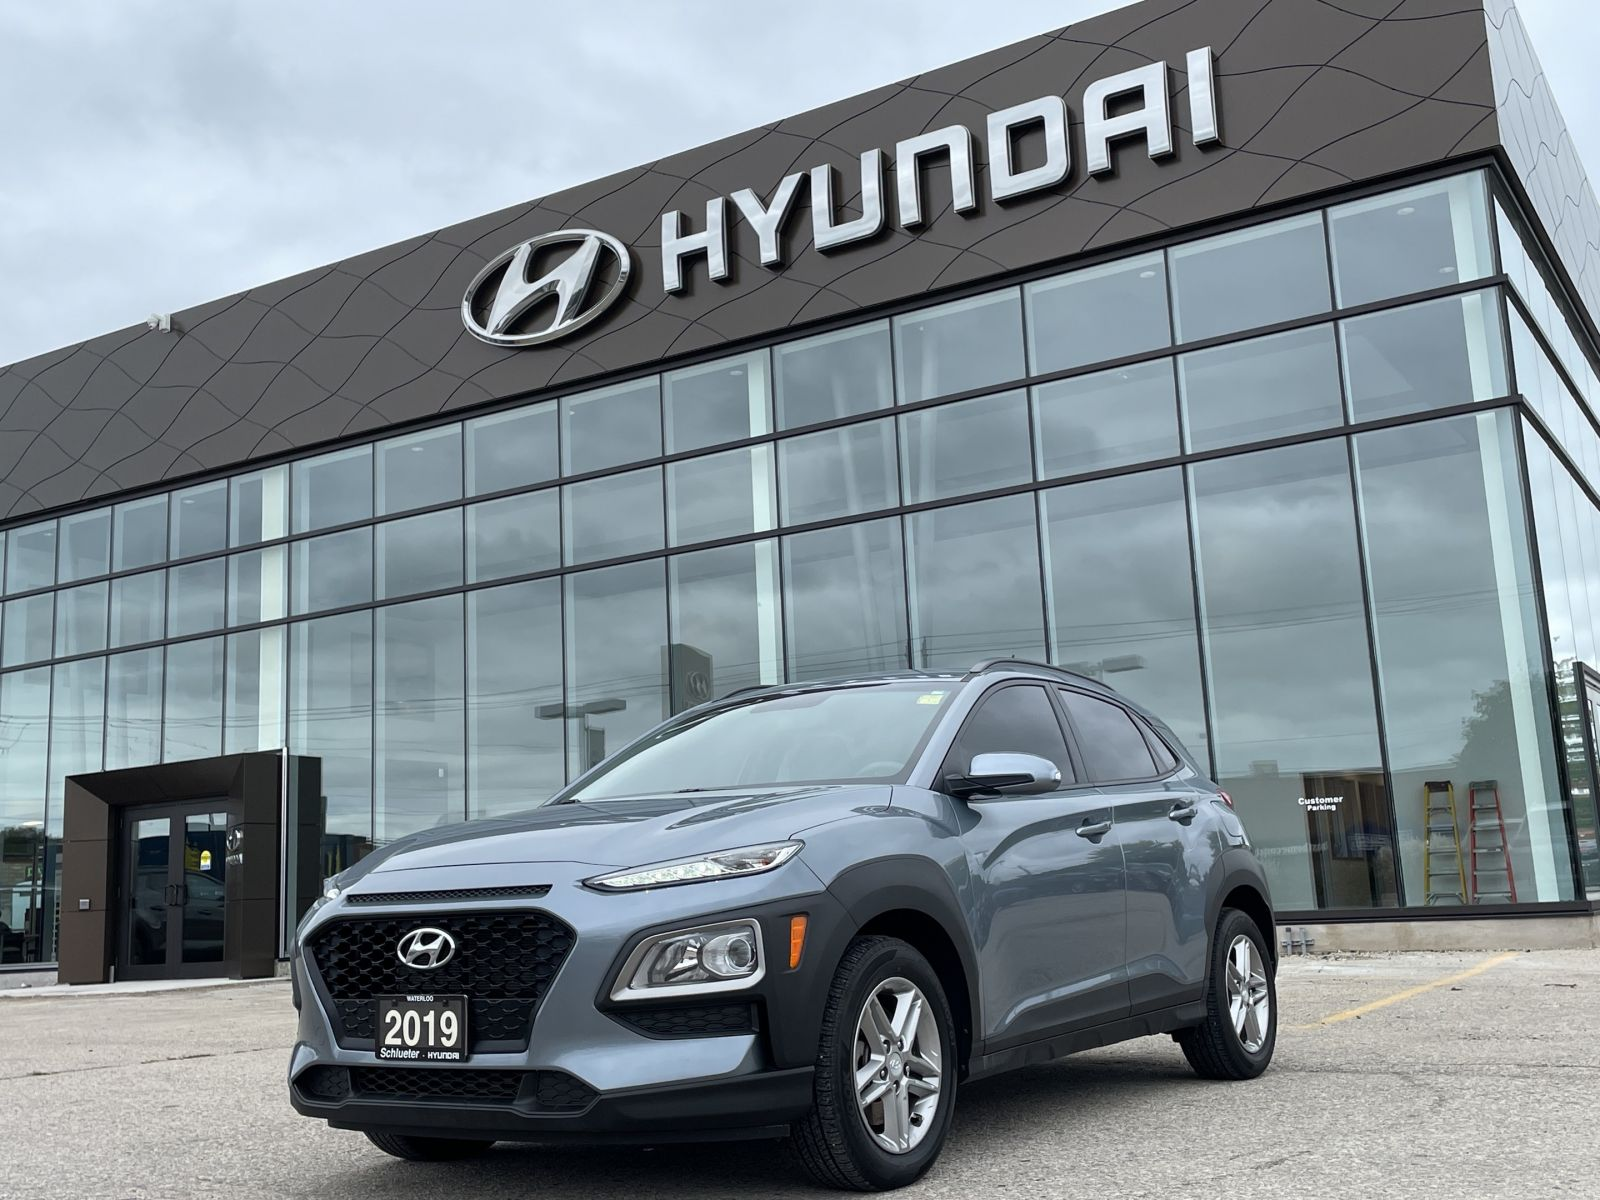 2019 Hyundai Kona Image